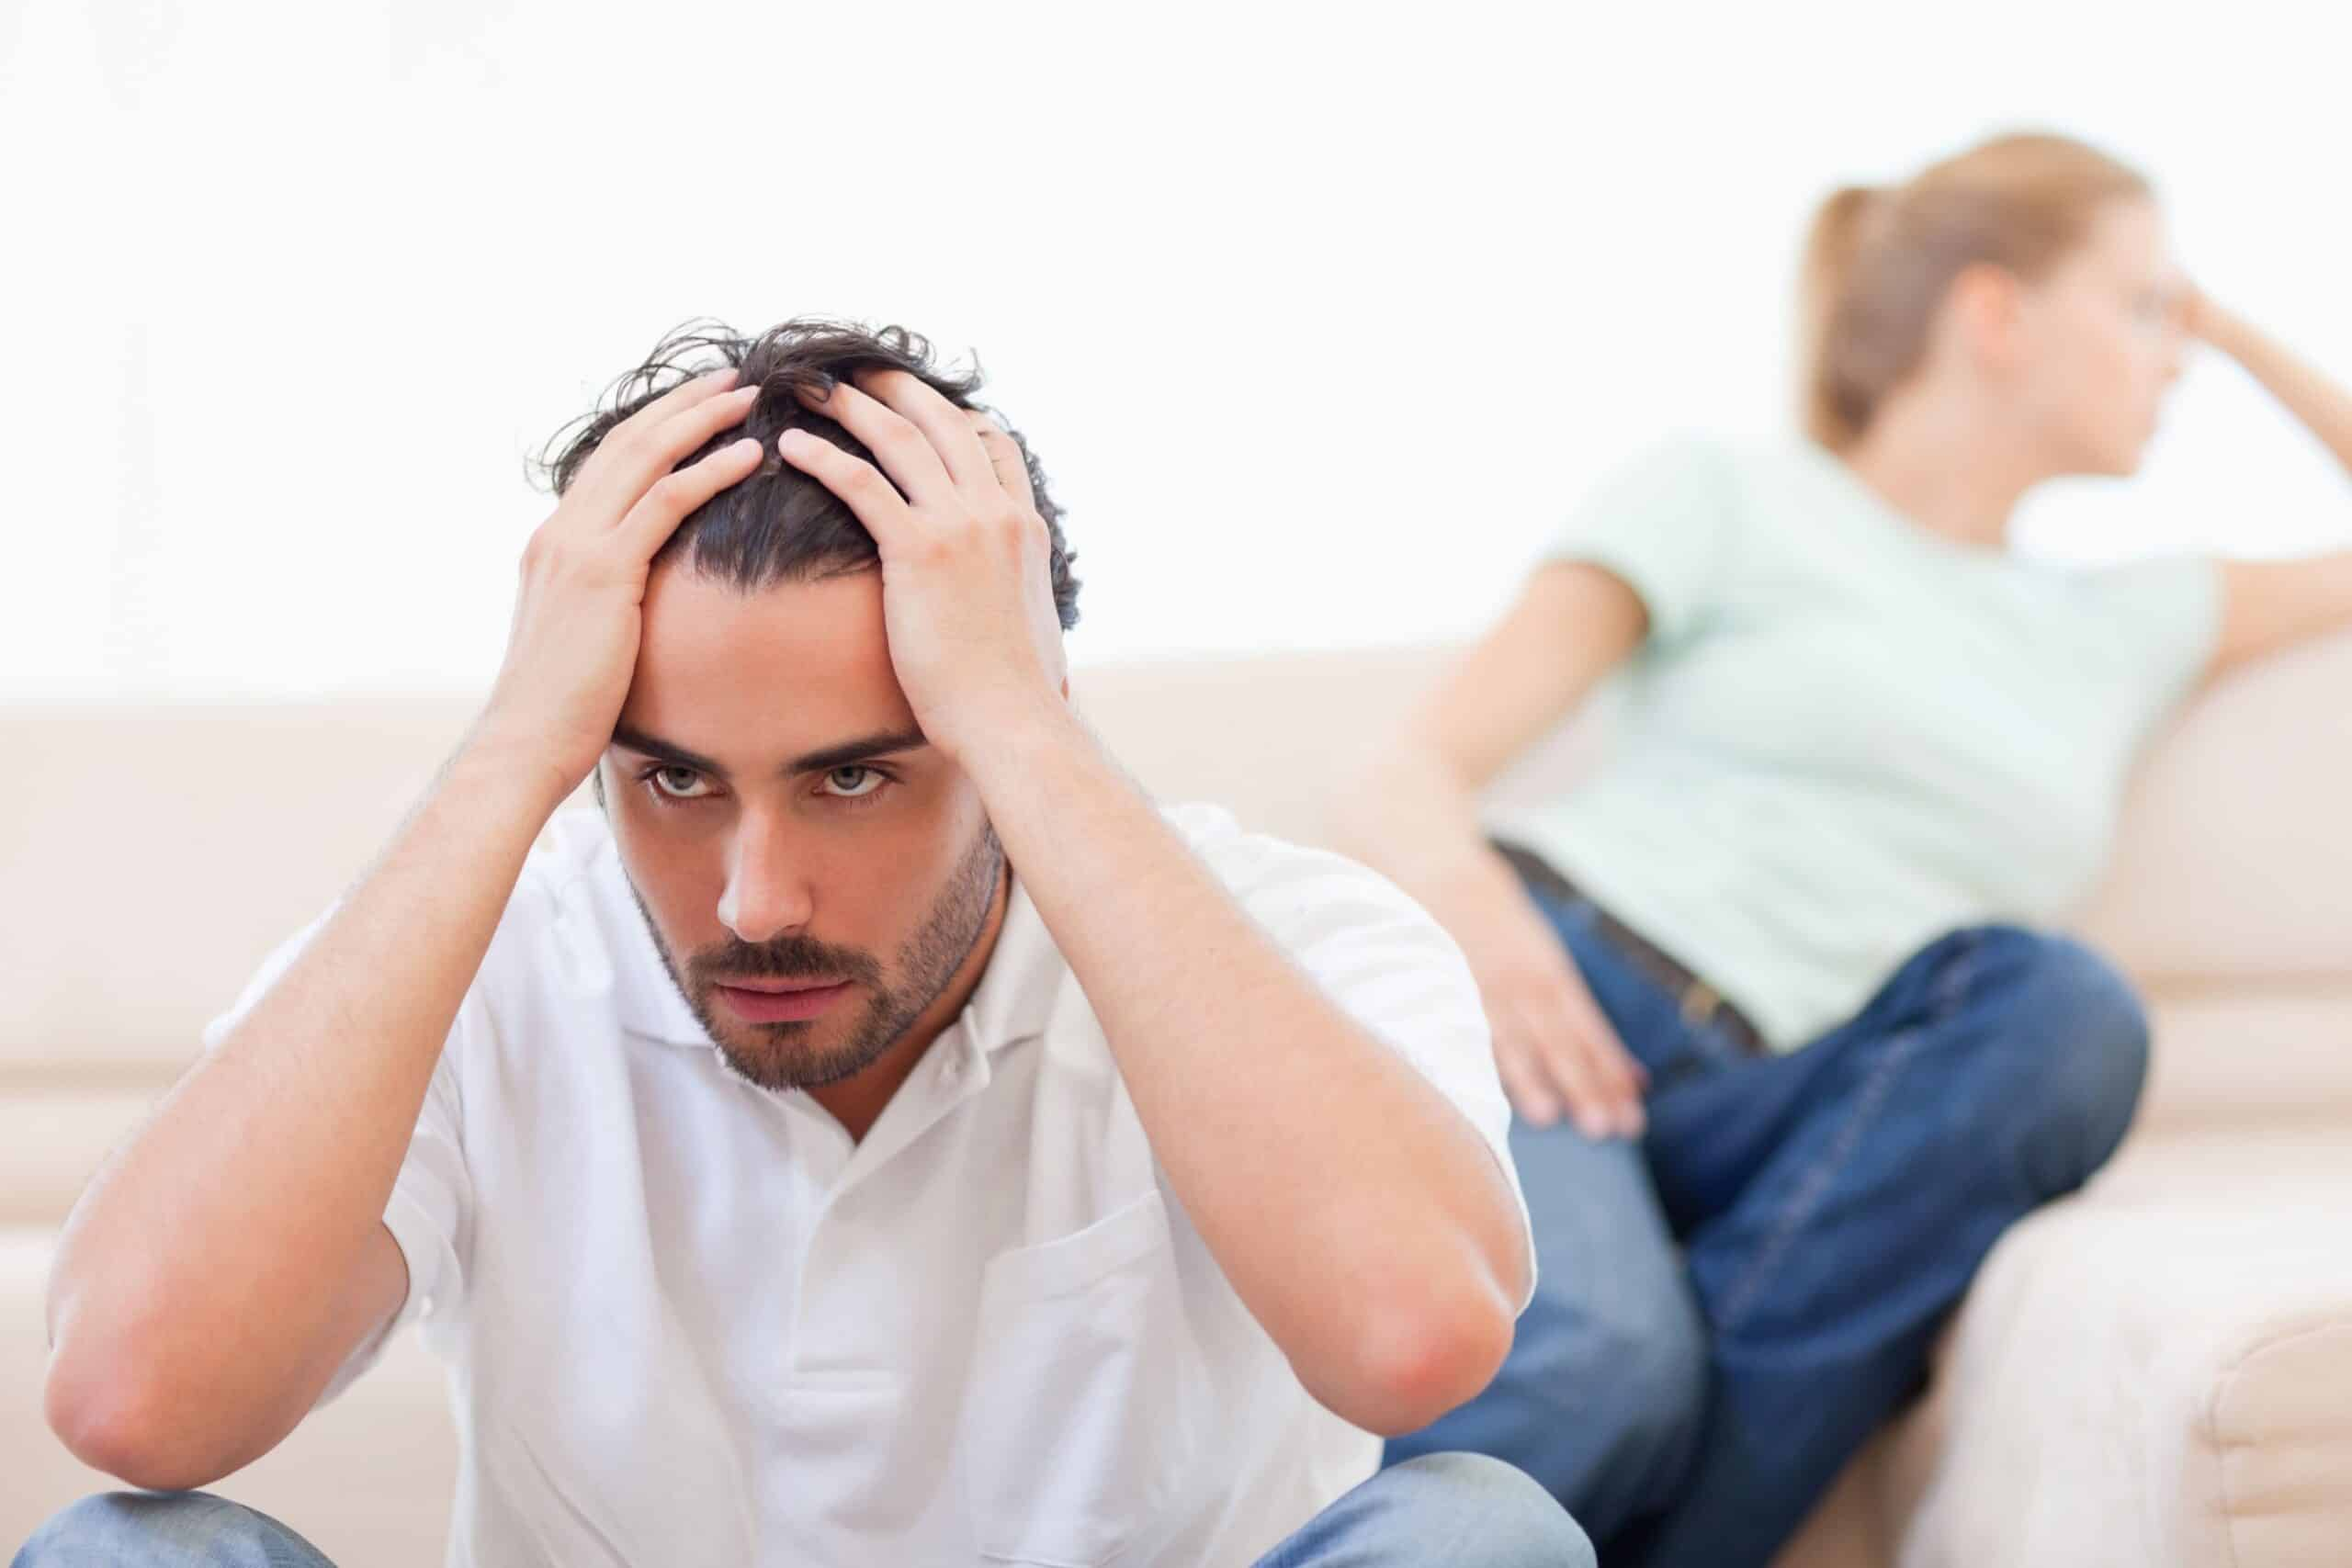 Wife threatened divorce